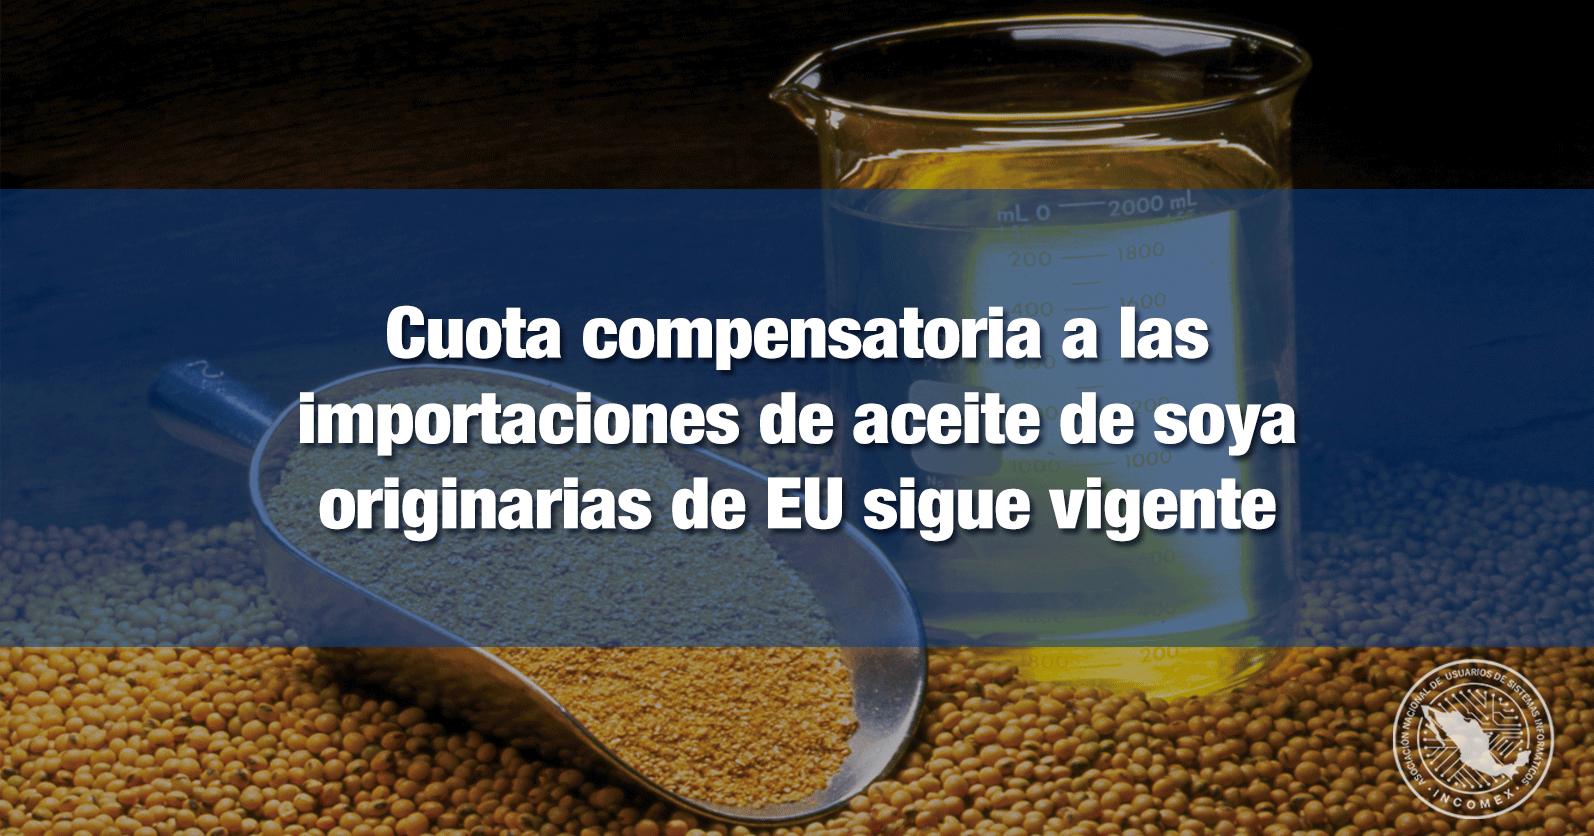 Cuota compensatoria a las importaciones de aceite de soya originarias de EU sigue vigente